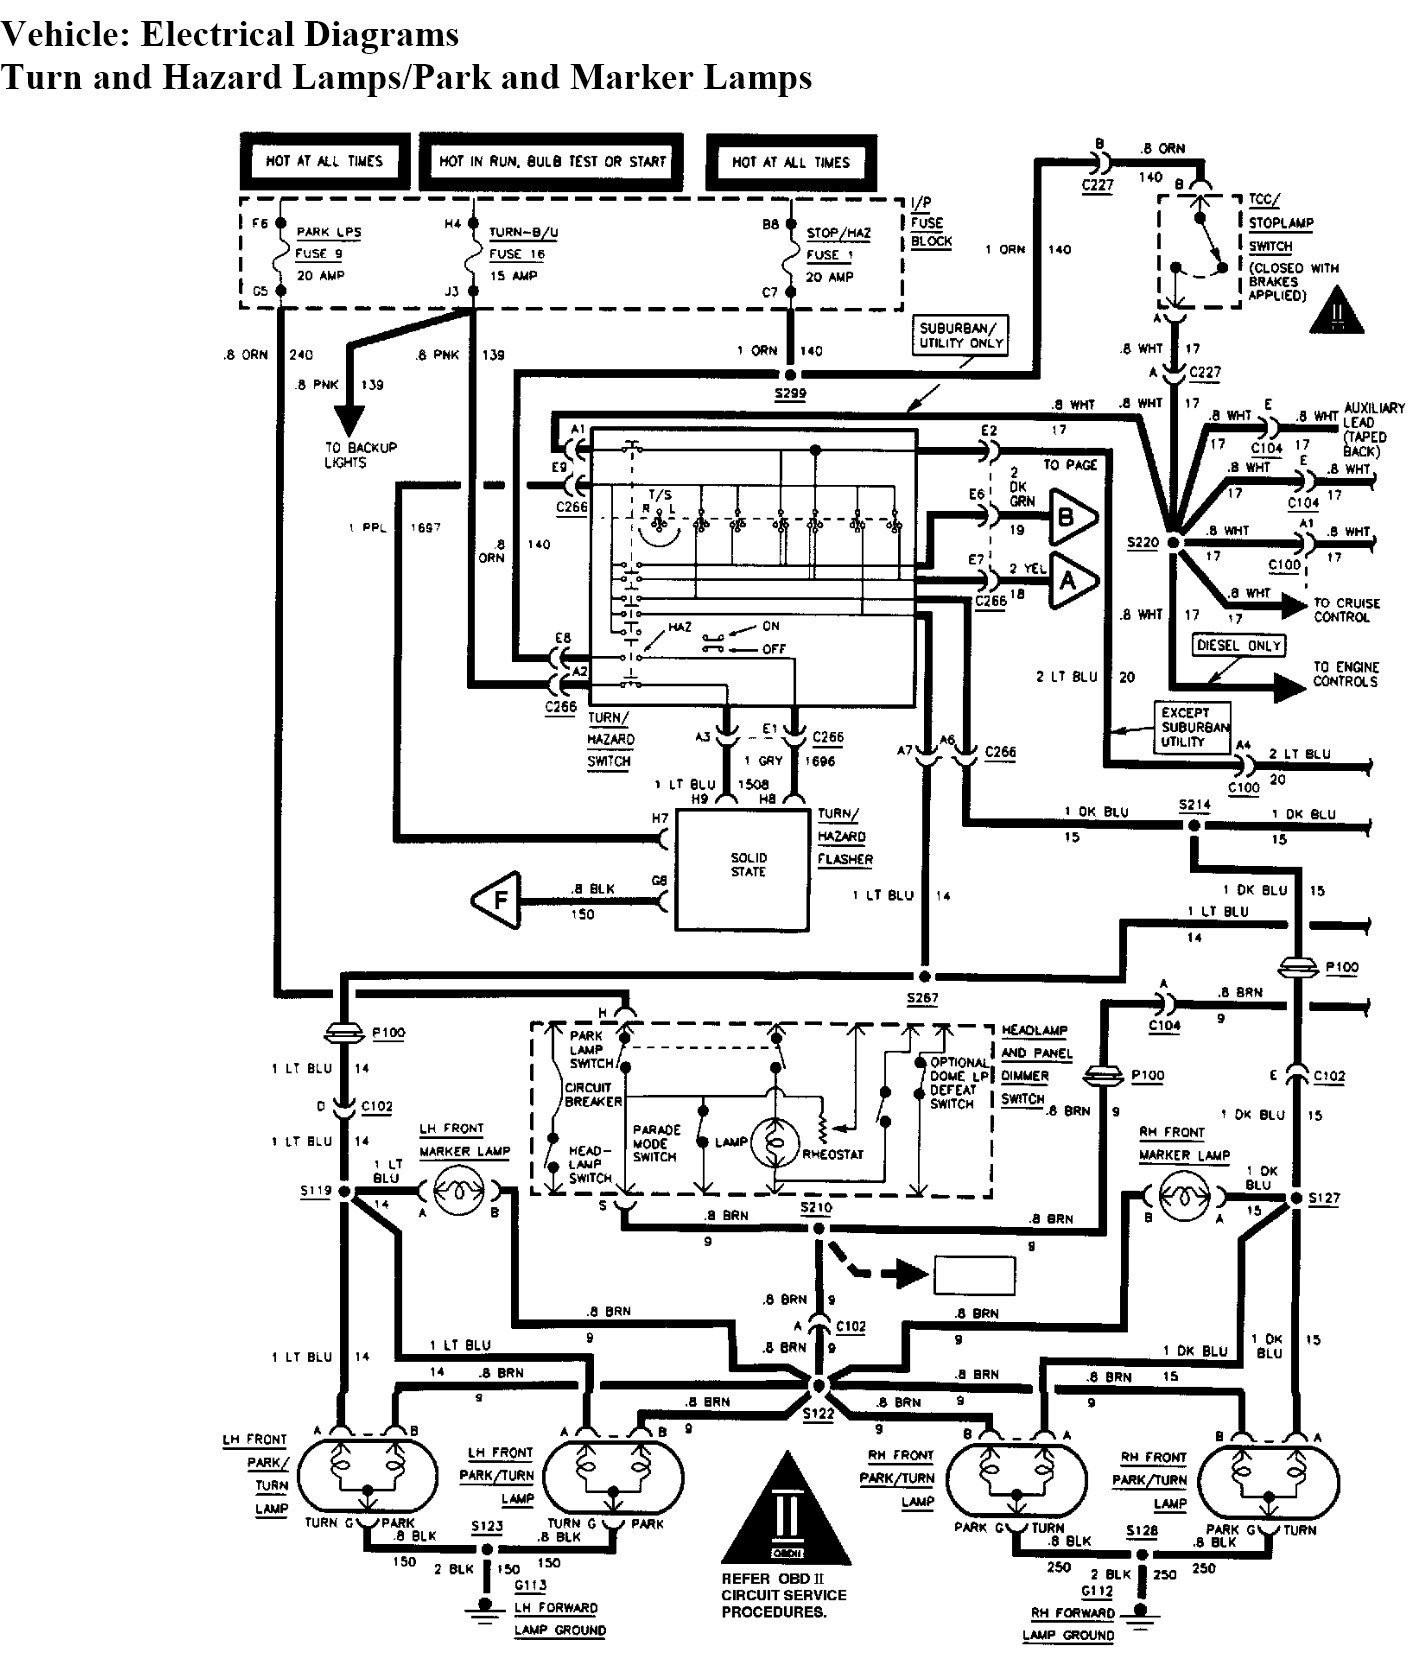 2003 Chevy Silverado Tail Light Wiring Diagram 2000 Chevy Silverado Brake Light Switch Wiring Diagram New Brake Of 2003 Chevy Silverado Tail Light Wiring Diagram